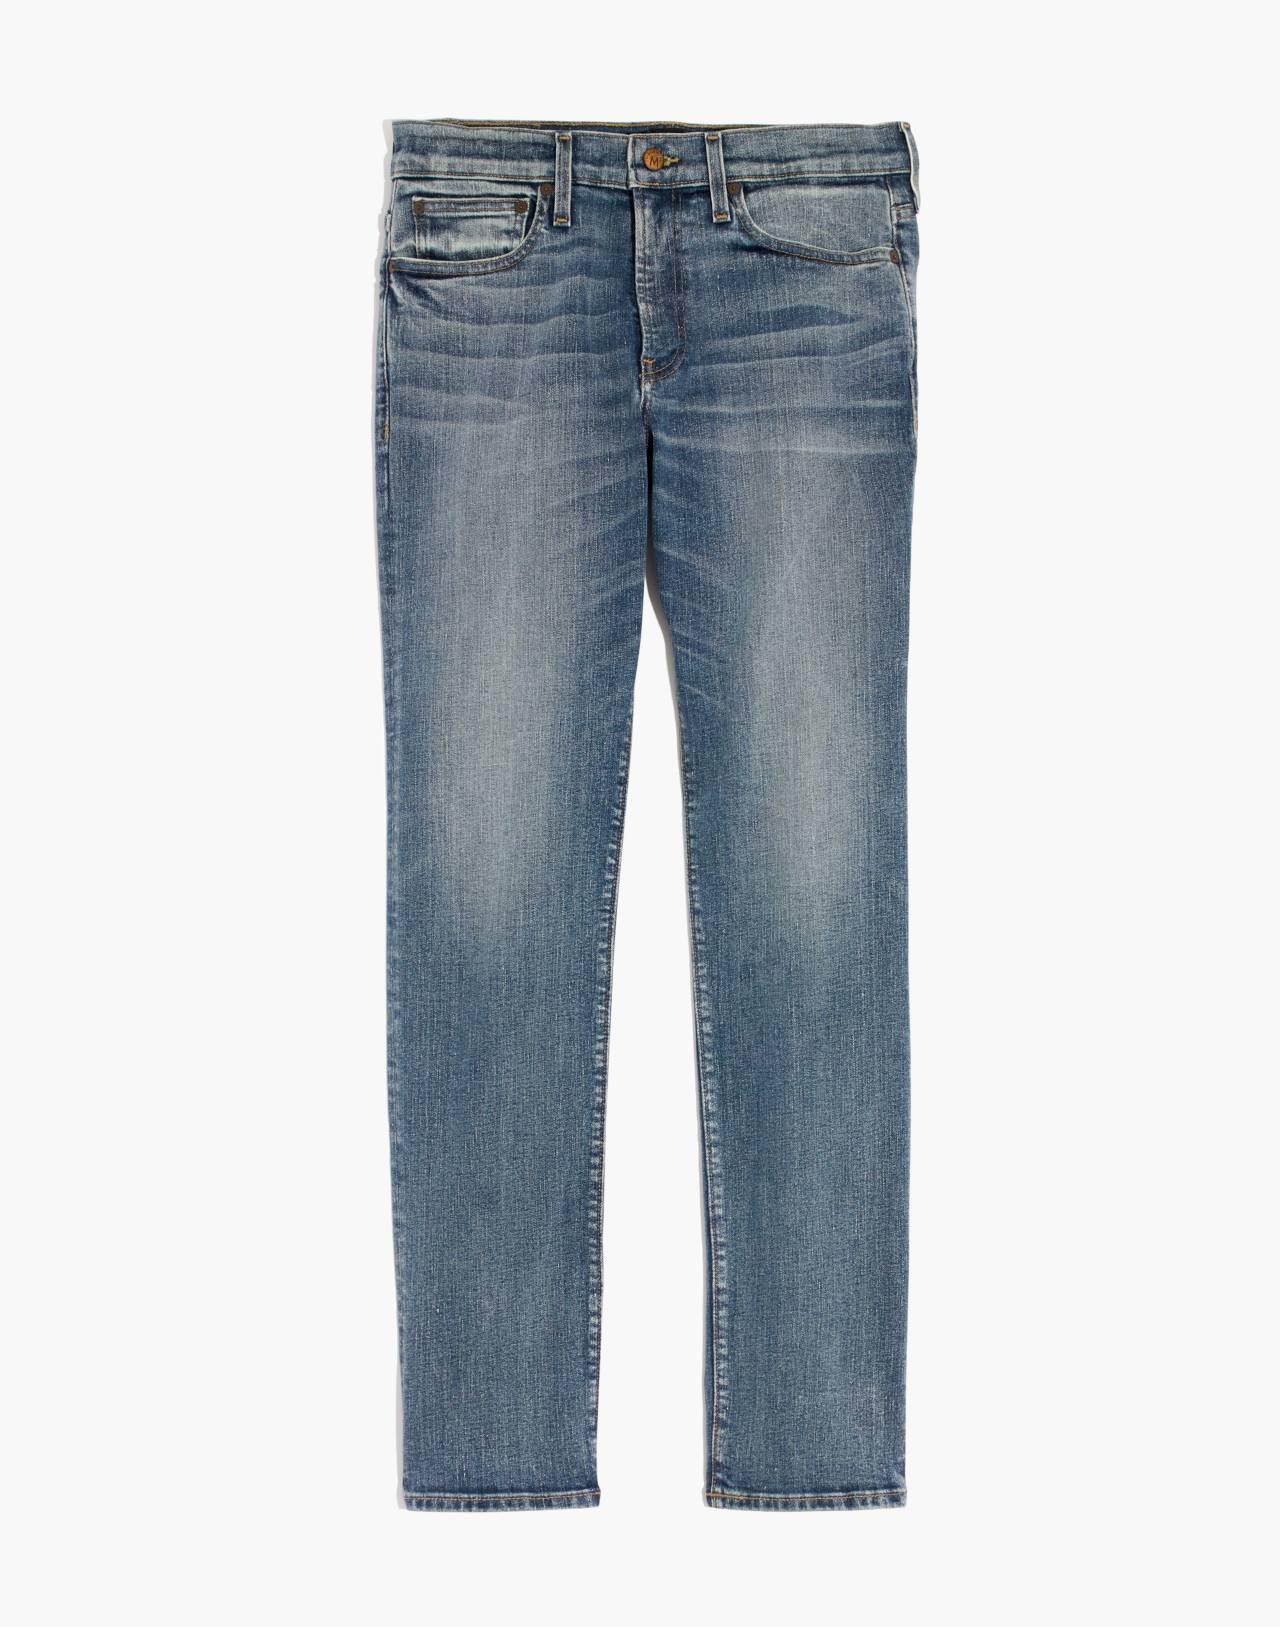 Slim Jeans in Danforth Wash in danforth wash image 4